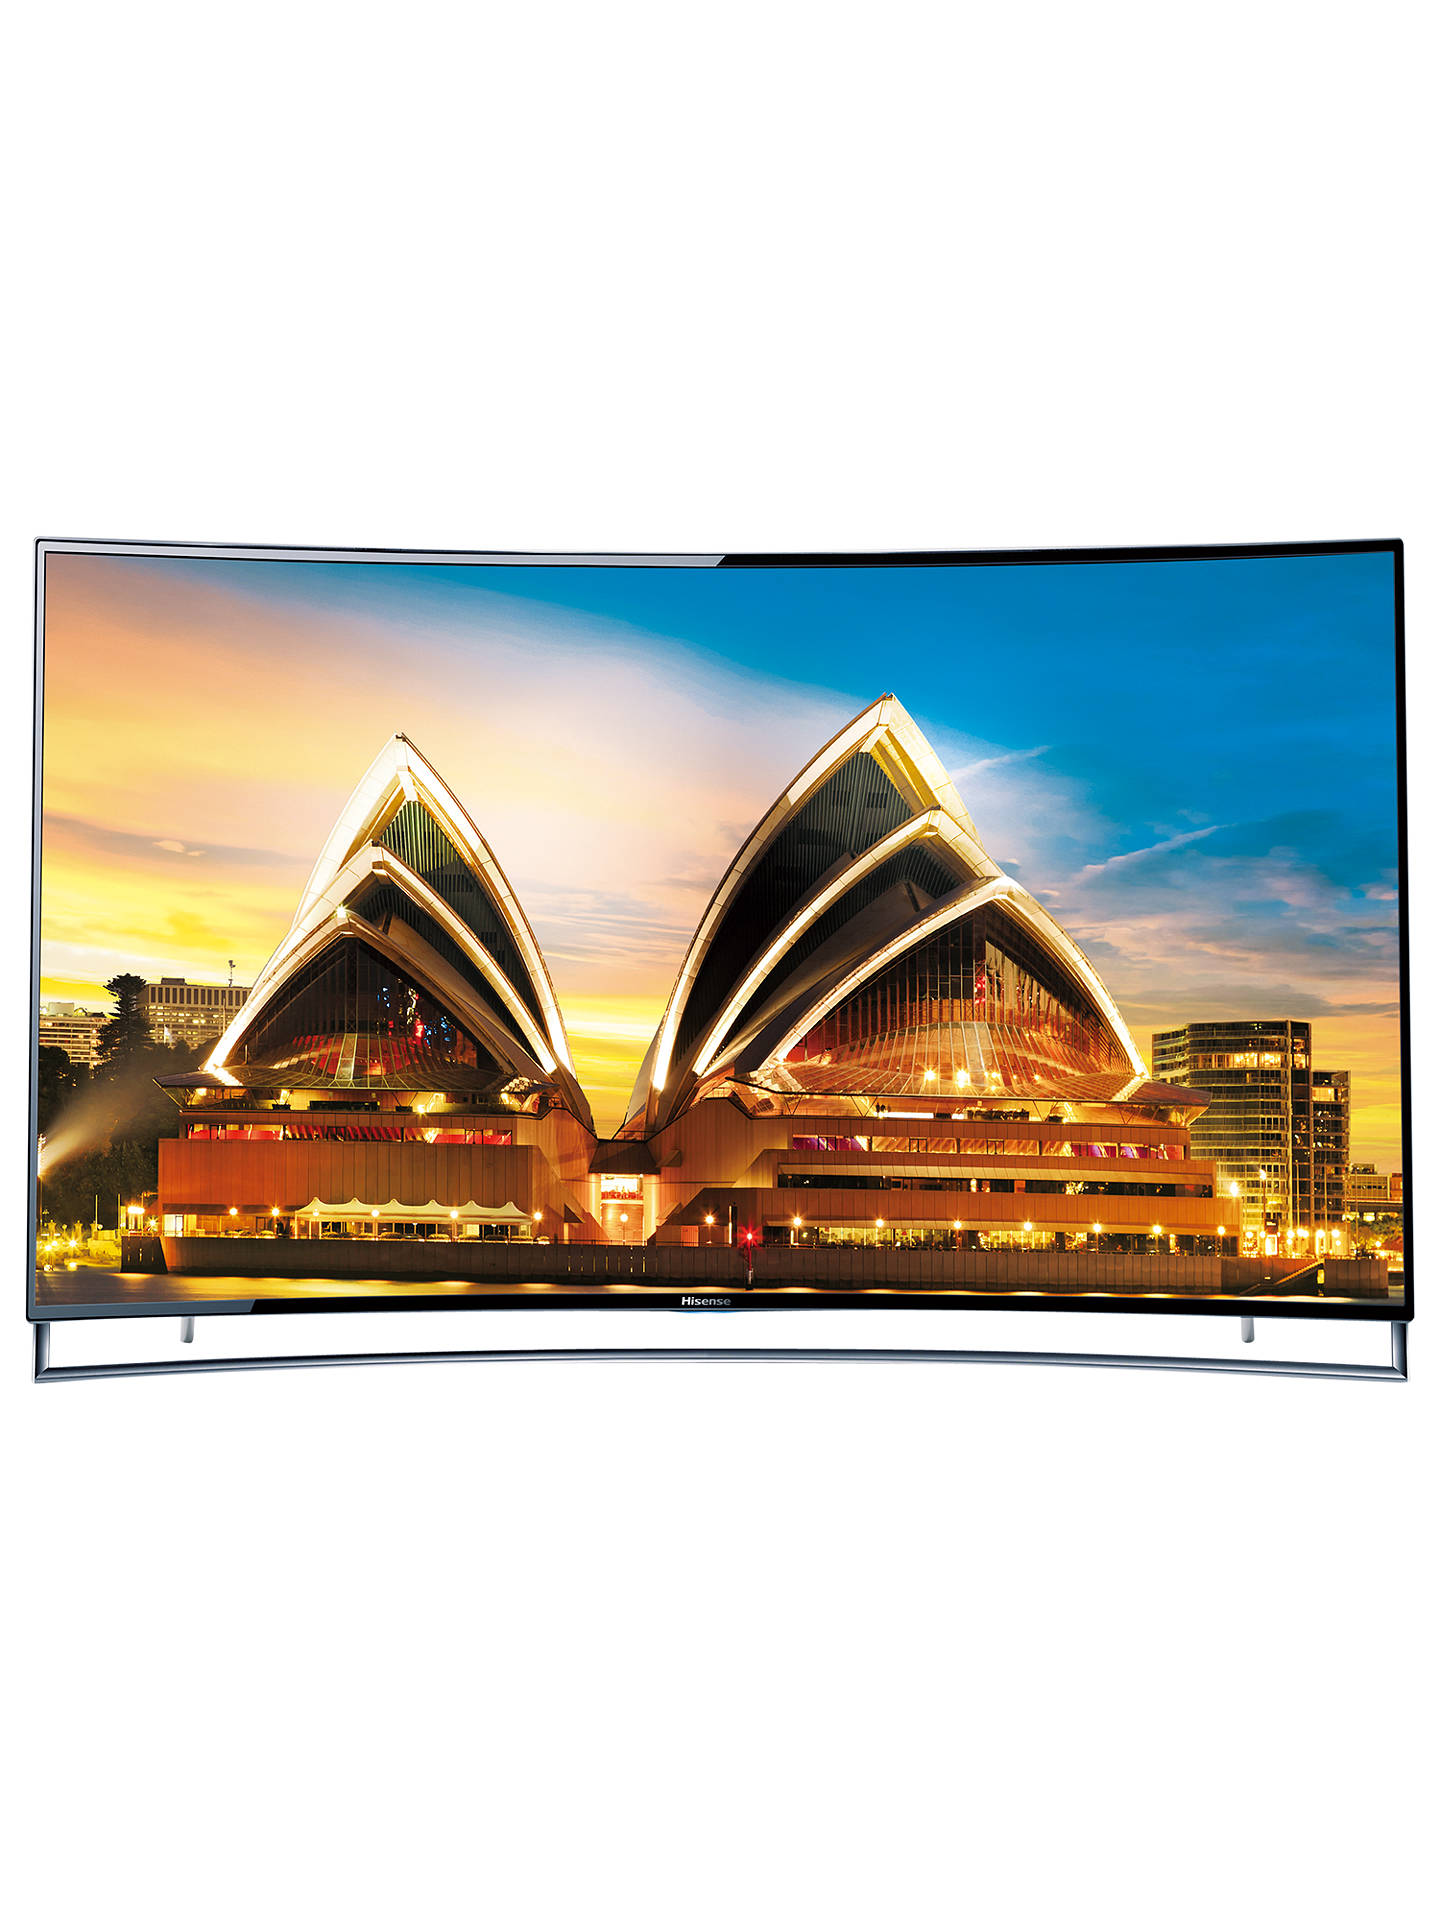 Hisense 65XT910 Curved 4K ULED 3D Smart TV, 65